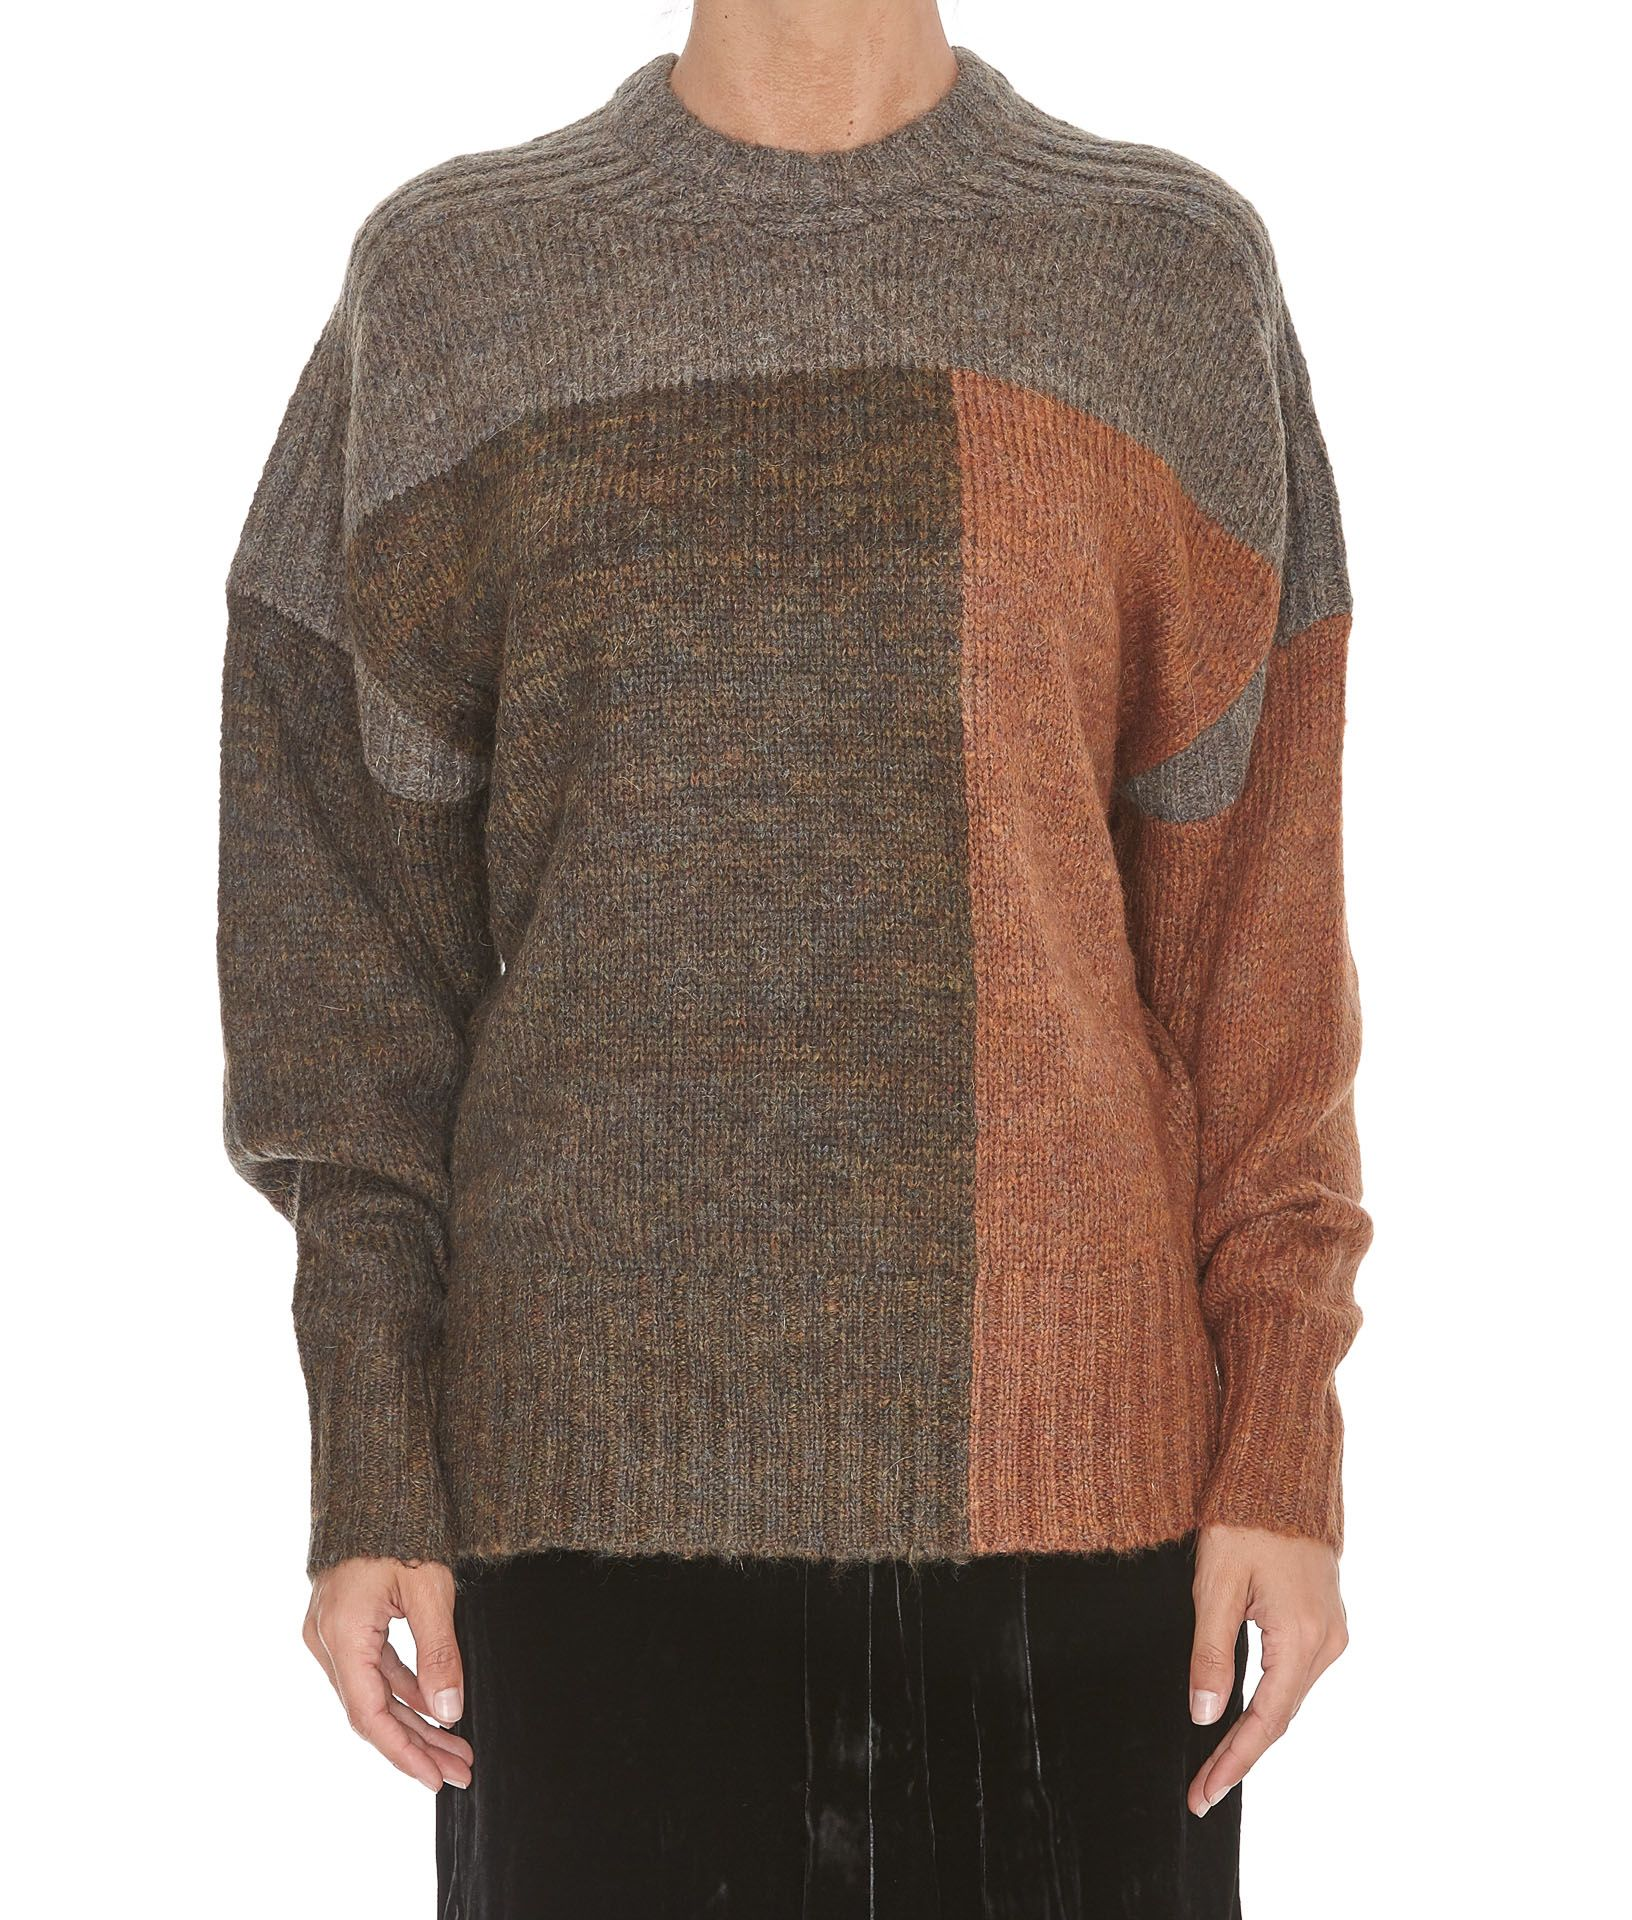 isabel marant etoile isabel marant etoile davy sweater rust women 39 s sweaters italist. Black Bedroom Furniture Sets. Home Design Ideas